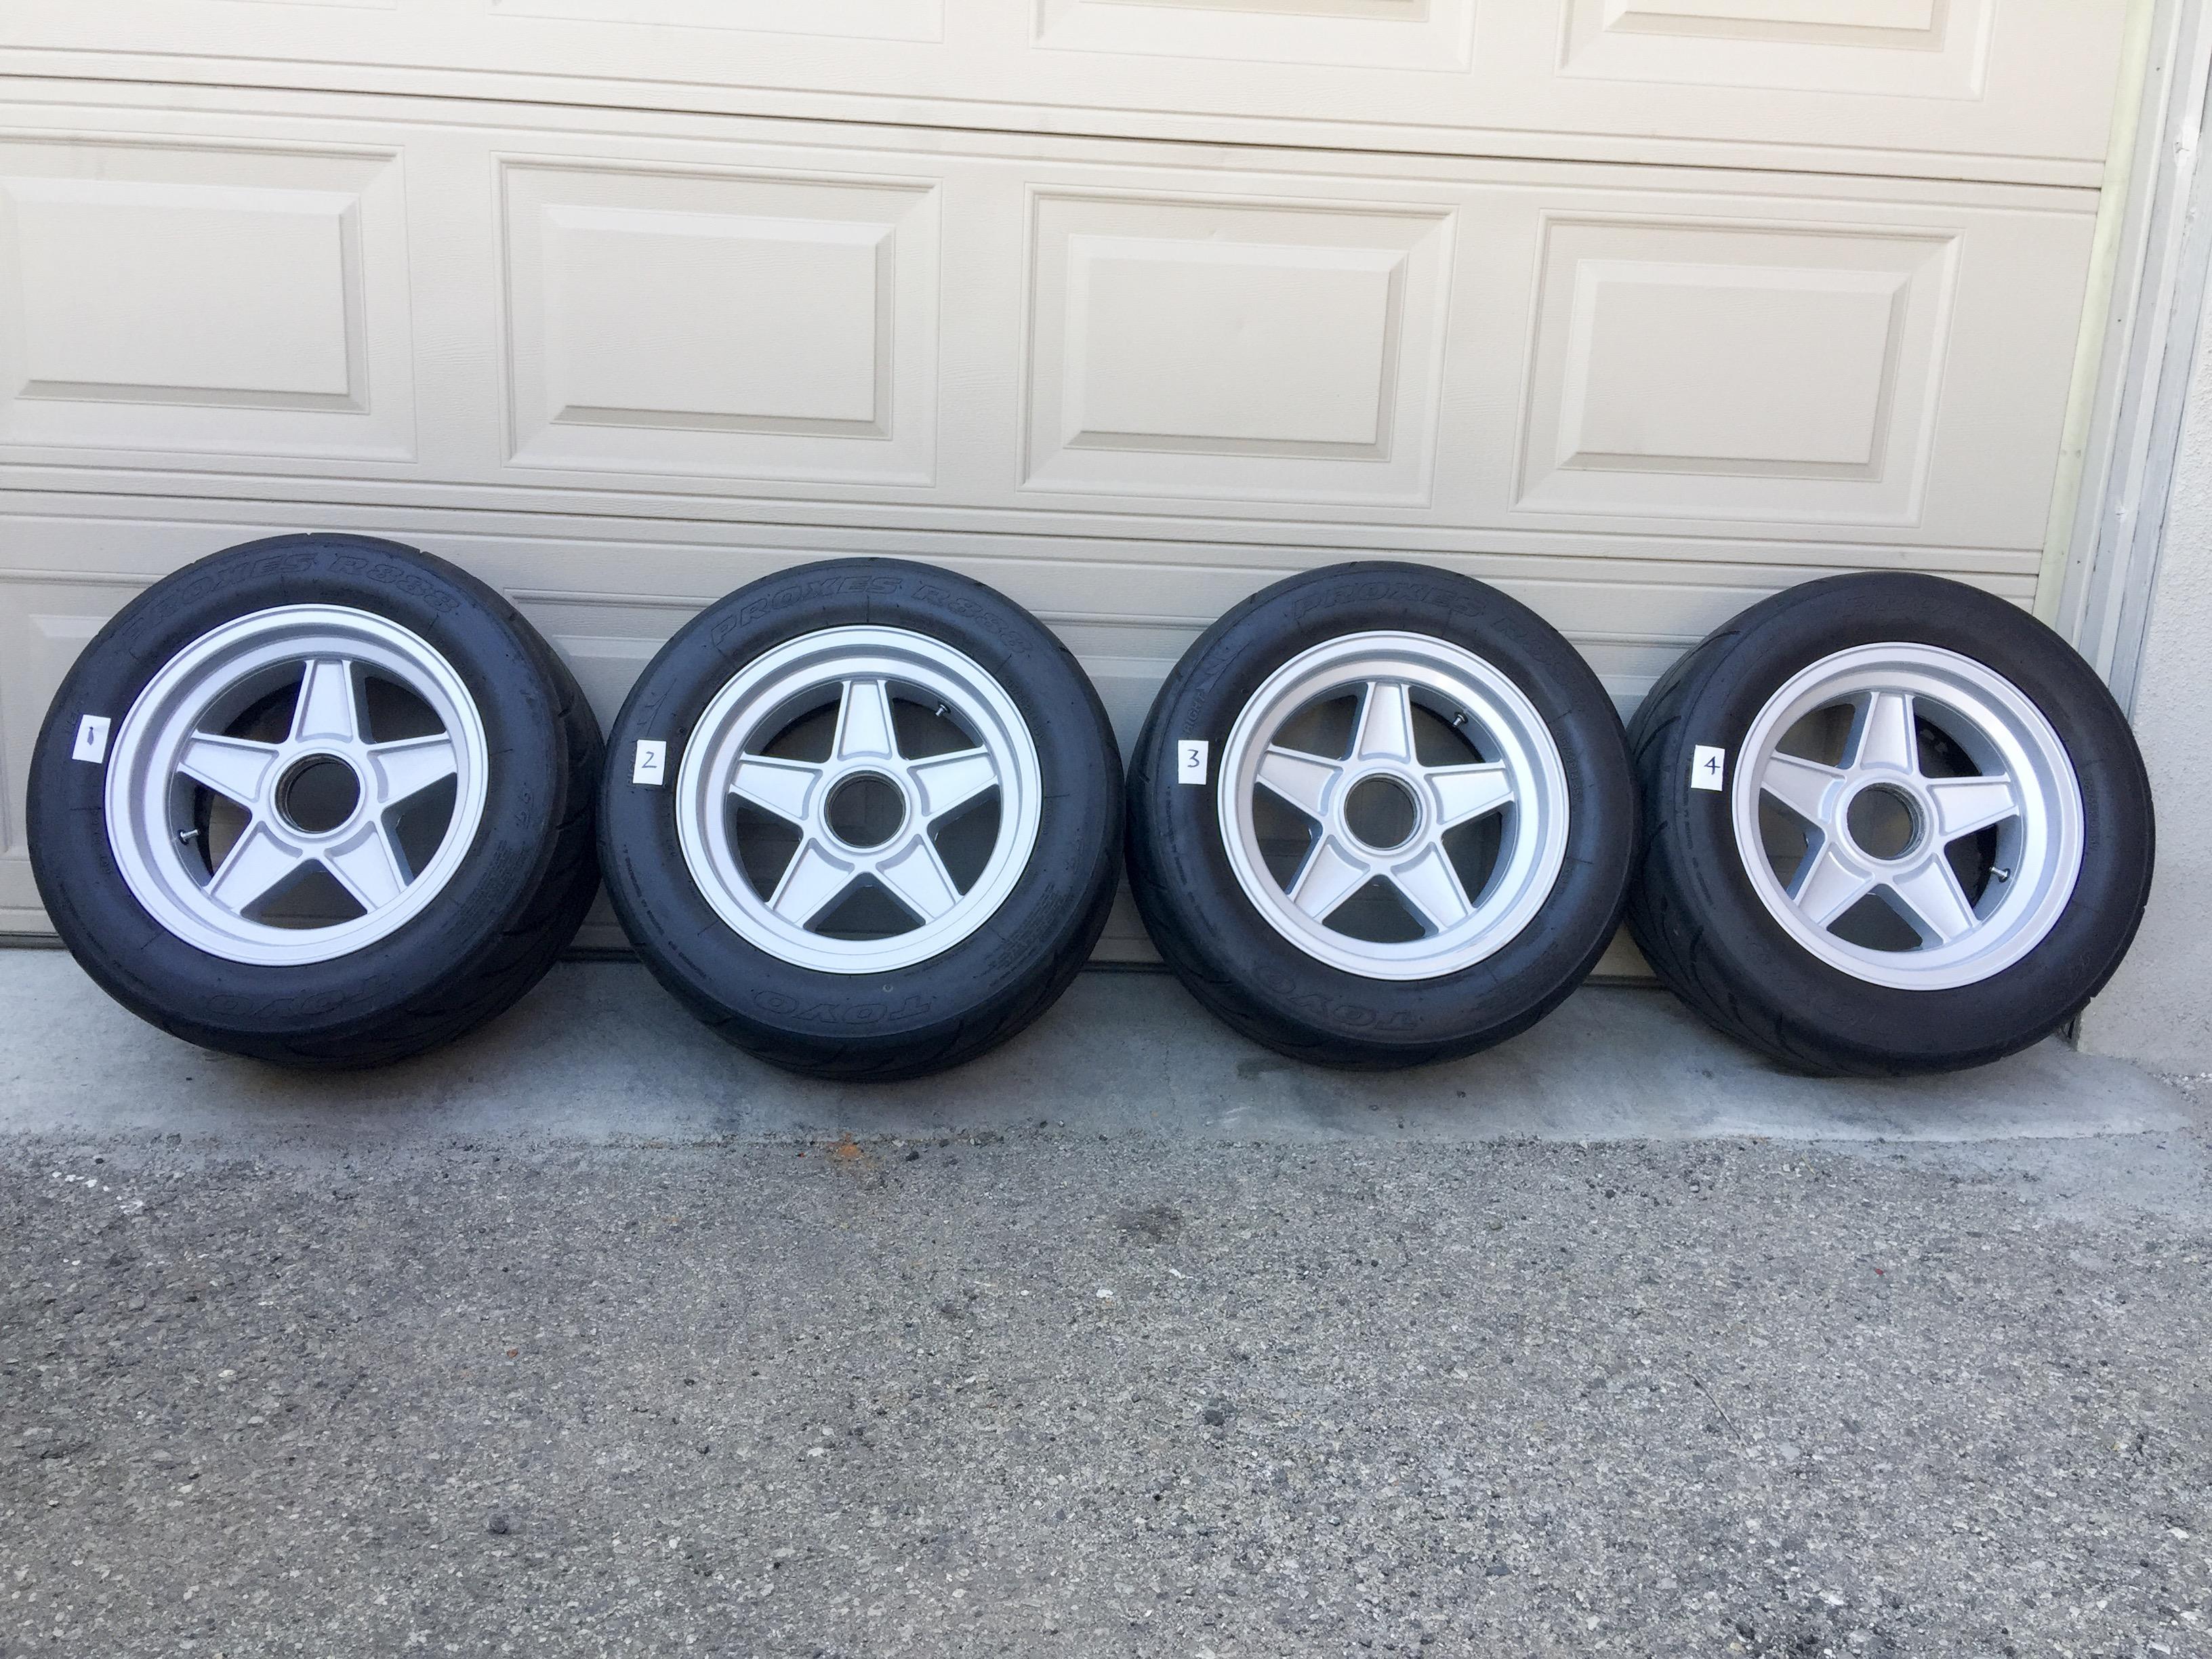 Z Car Blog Vintage Jdm Wheels Hayashi Racing Super Street Center Lock